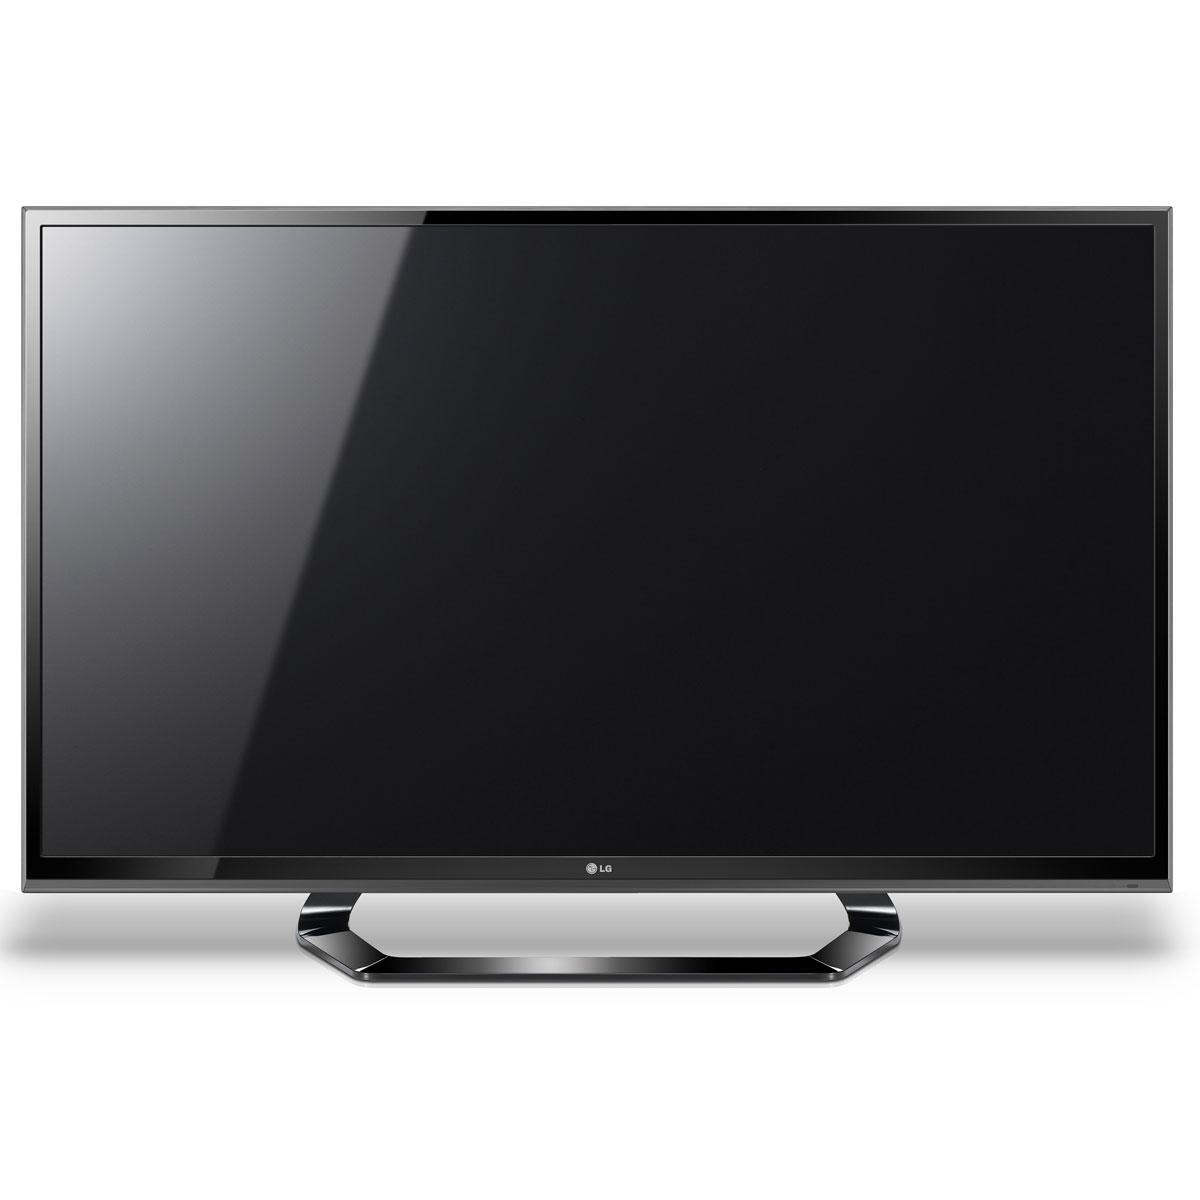 Lg 47lm615s 47lm615s achat vente tv sur - Support mural tv lg 119 cm ...